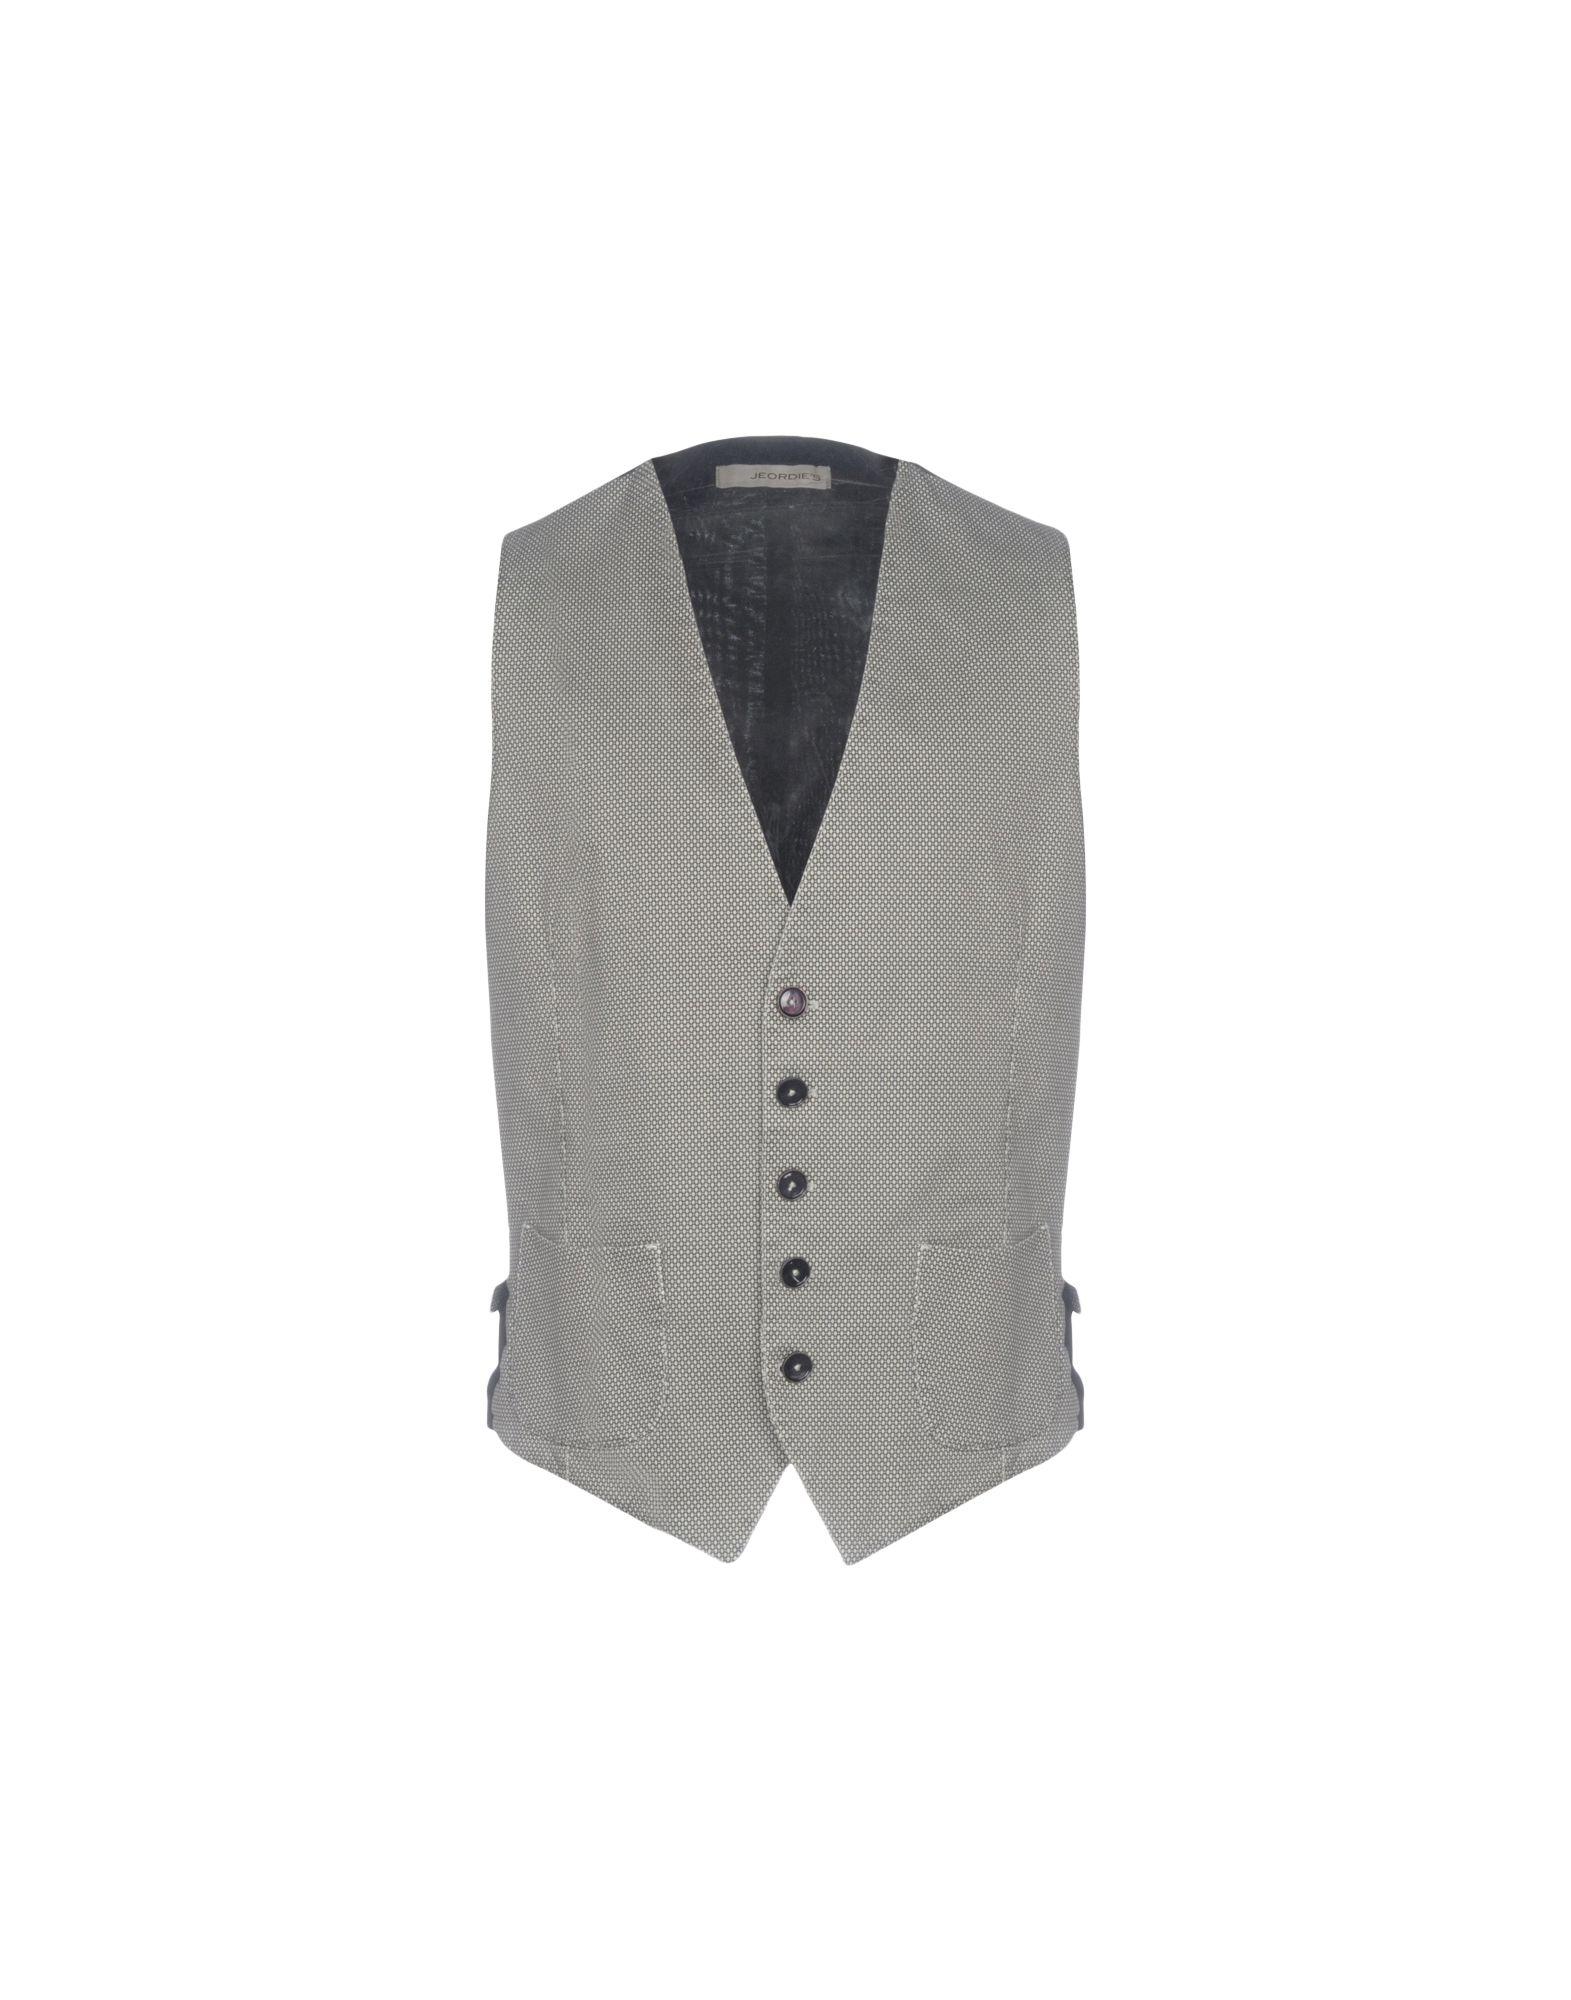 JEORDIES Vests in Light Grey